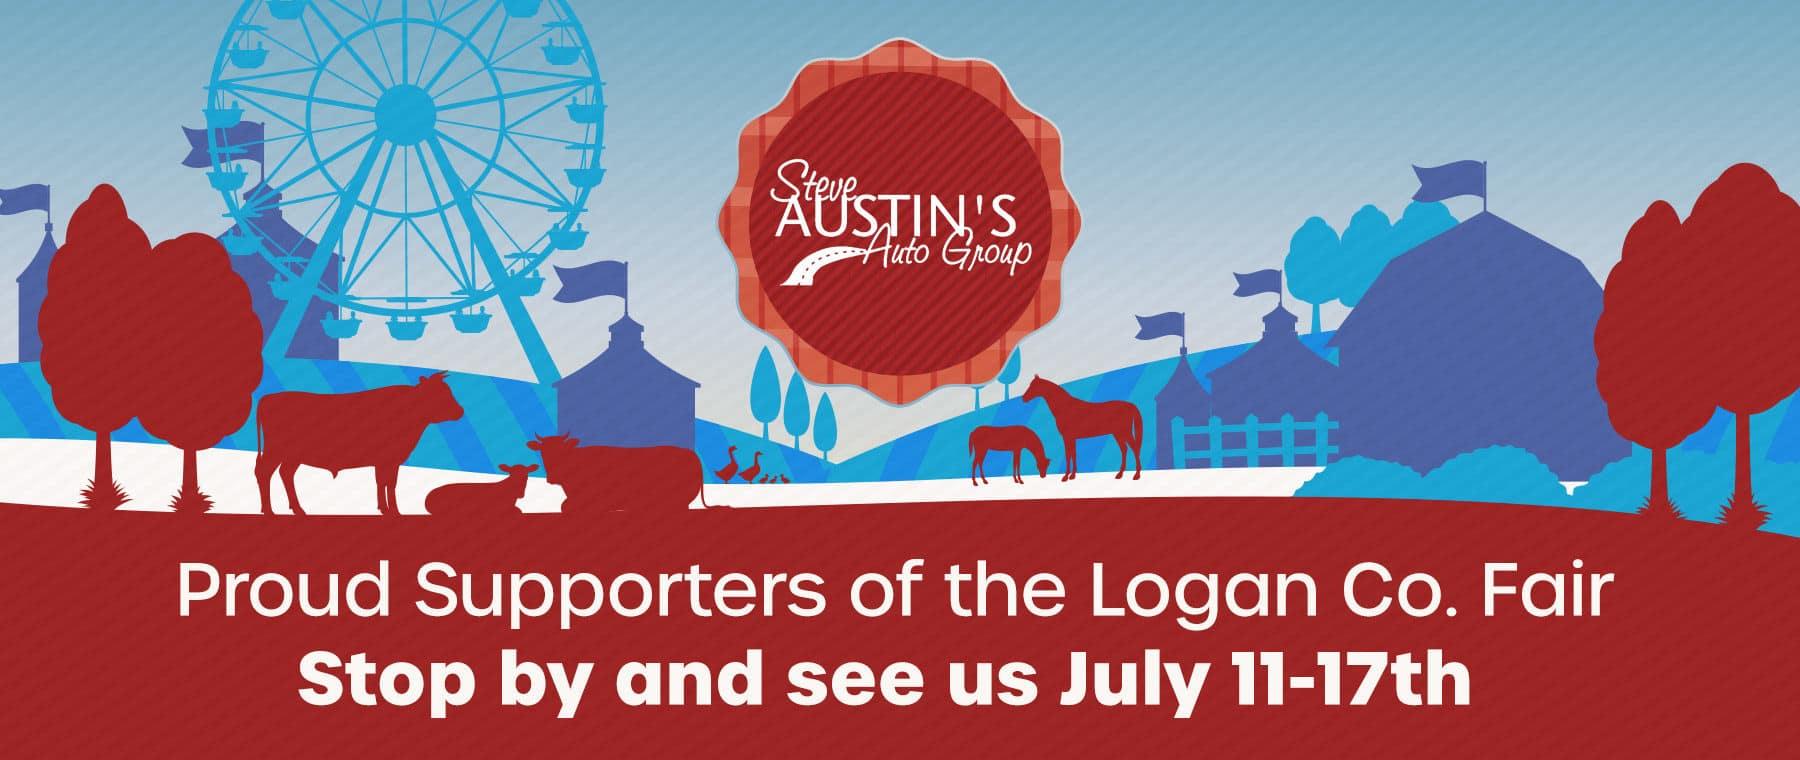 Logan County Fair Sponsors | Bellefontaine, OH